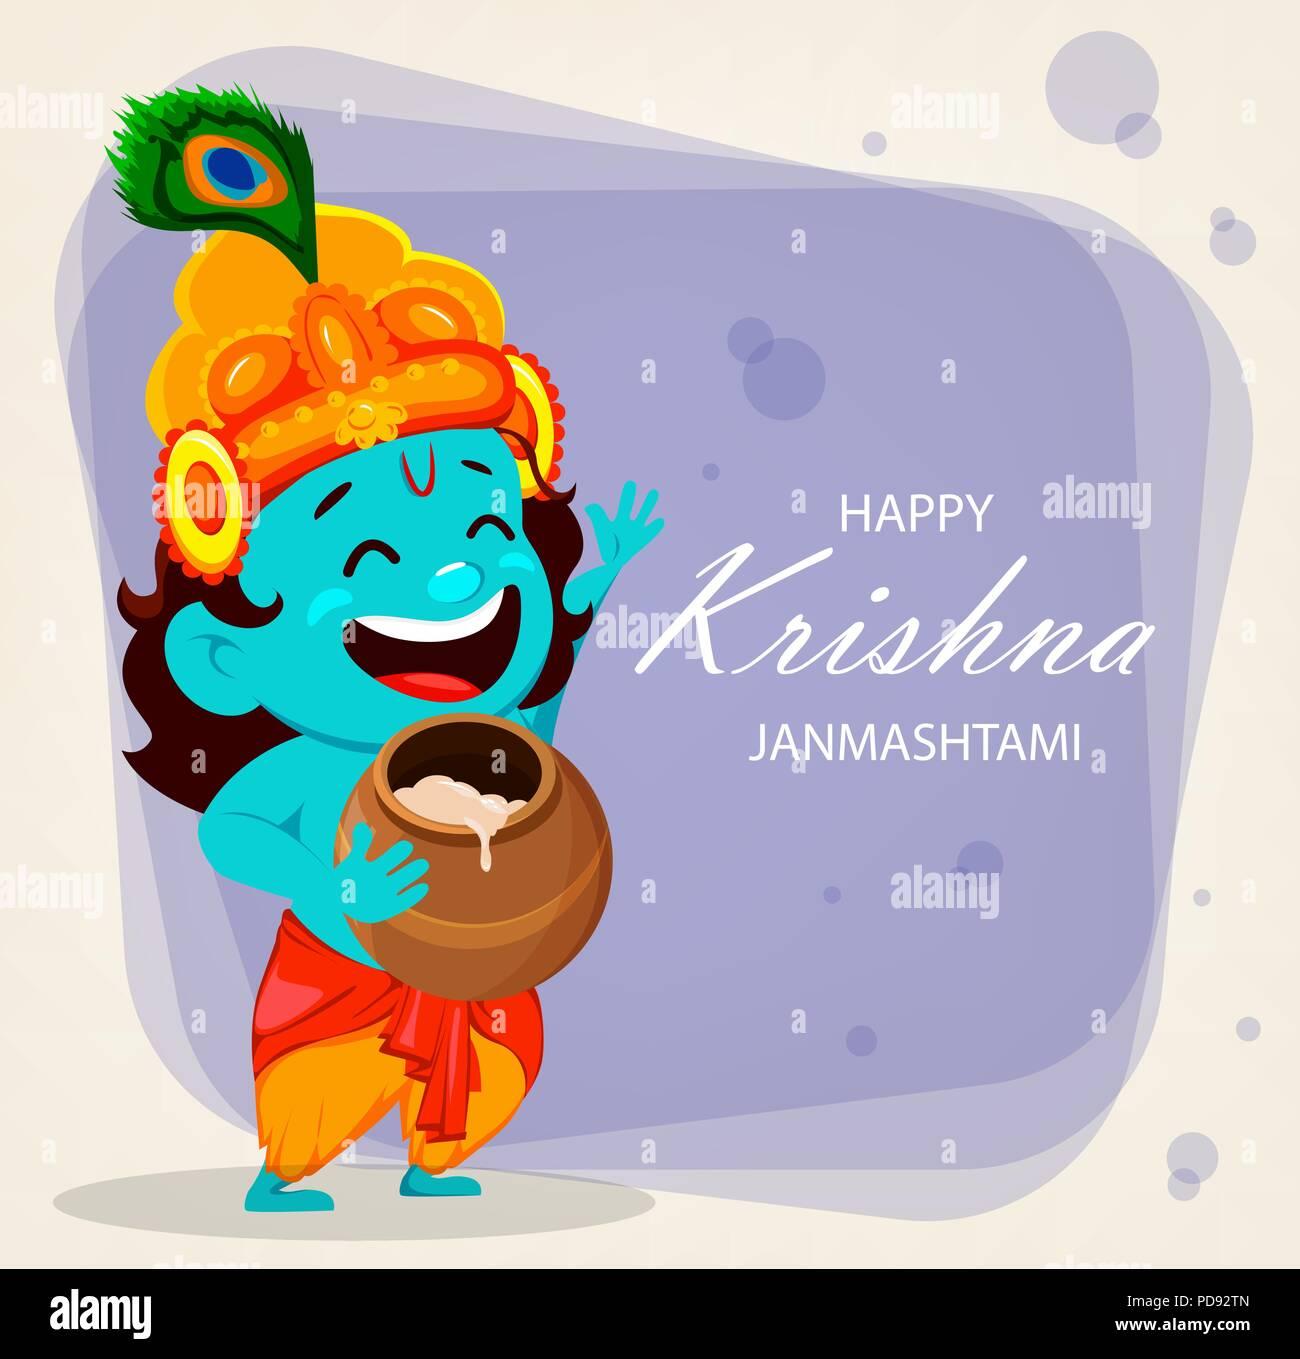 Happy Krishna Janmashtami greeting card. Funny cartoon character Lord Krishna Indian God holding pot. Vector illustration on purple background - Stock Image